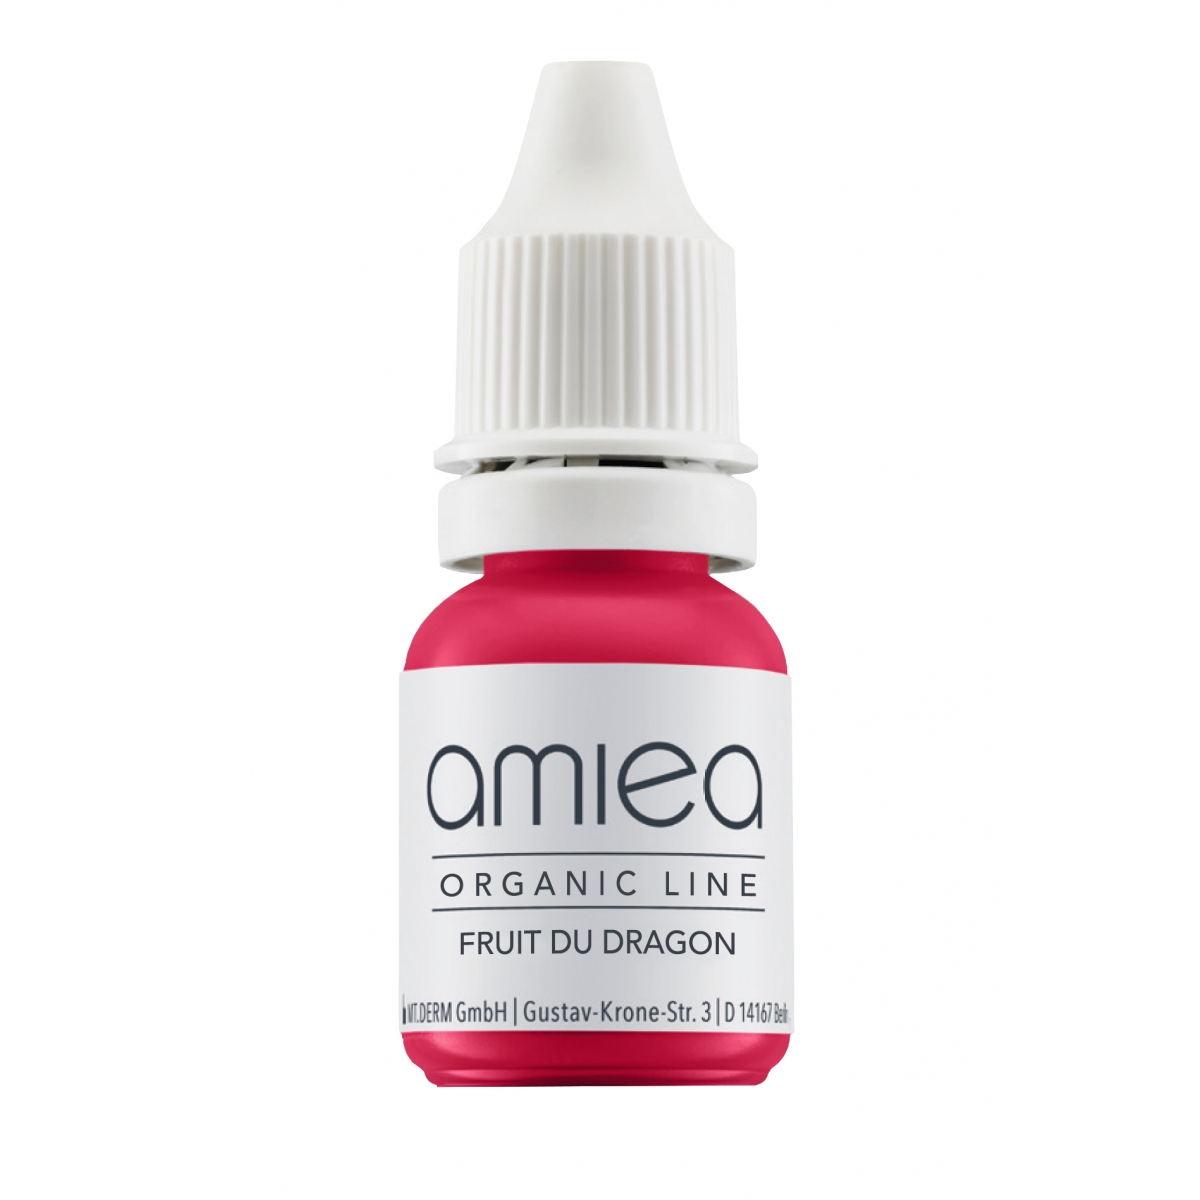 ORGANIC LINE (10ml) - PIGMENT FRUIT DU DRAGON ORGANICLINE AMIEA (10 ml)